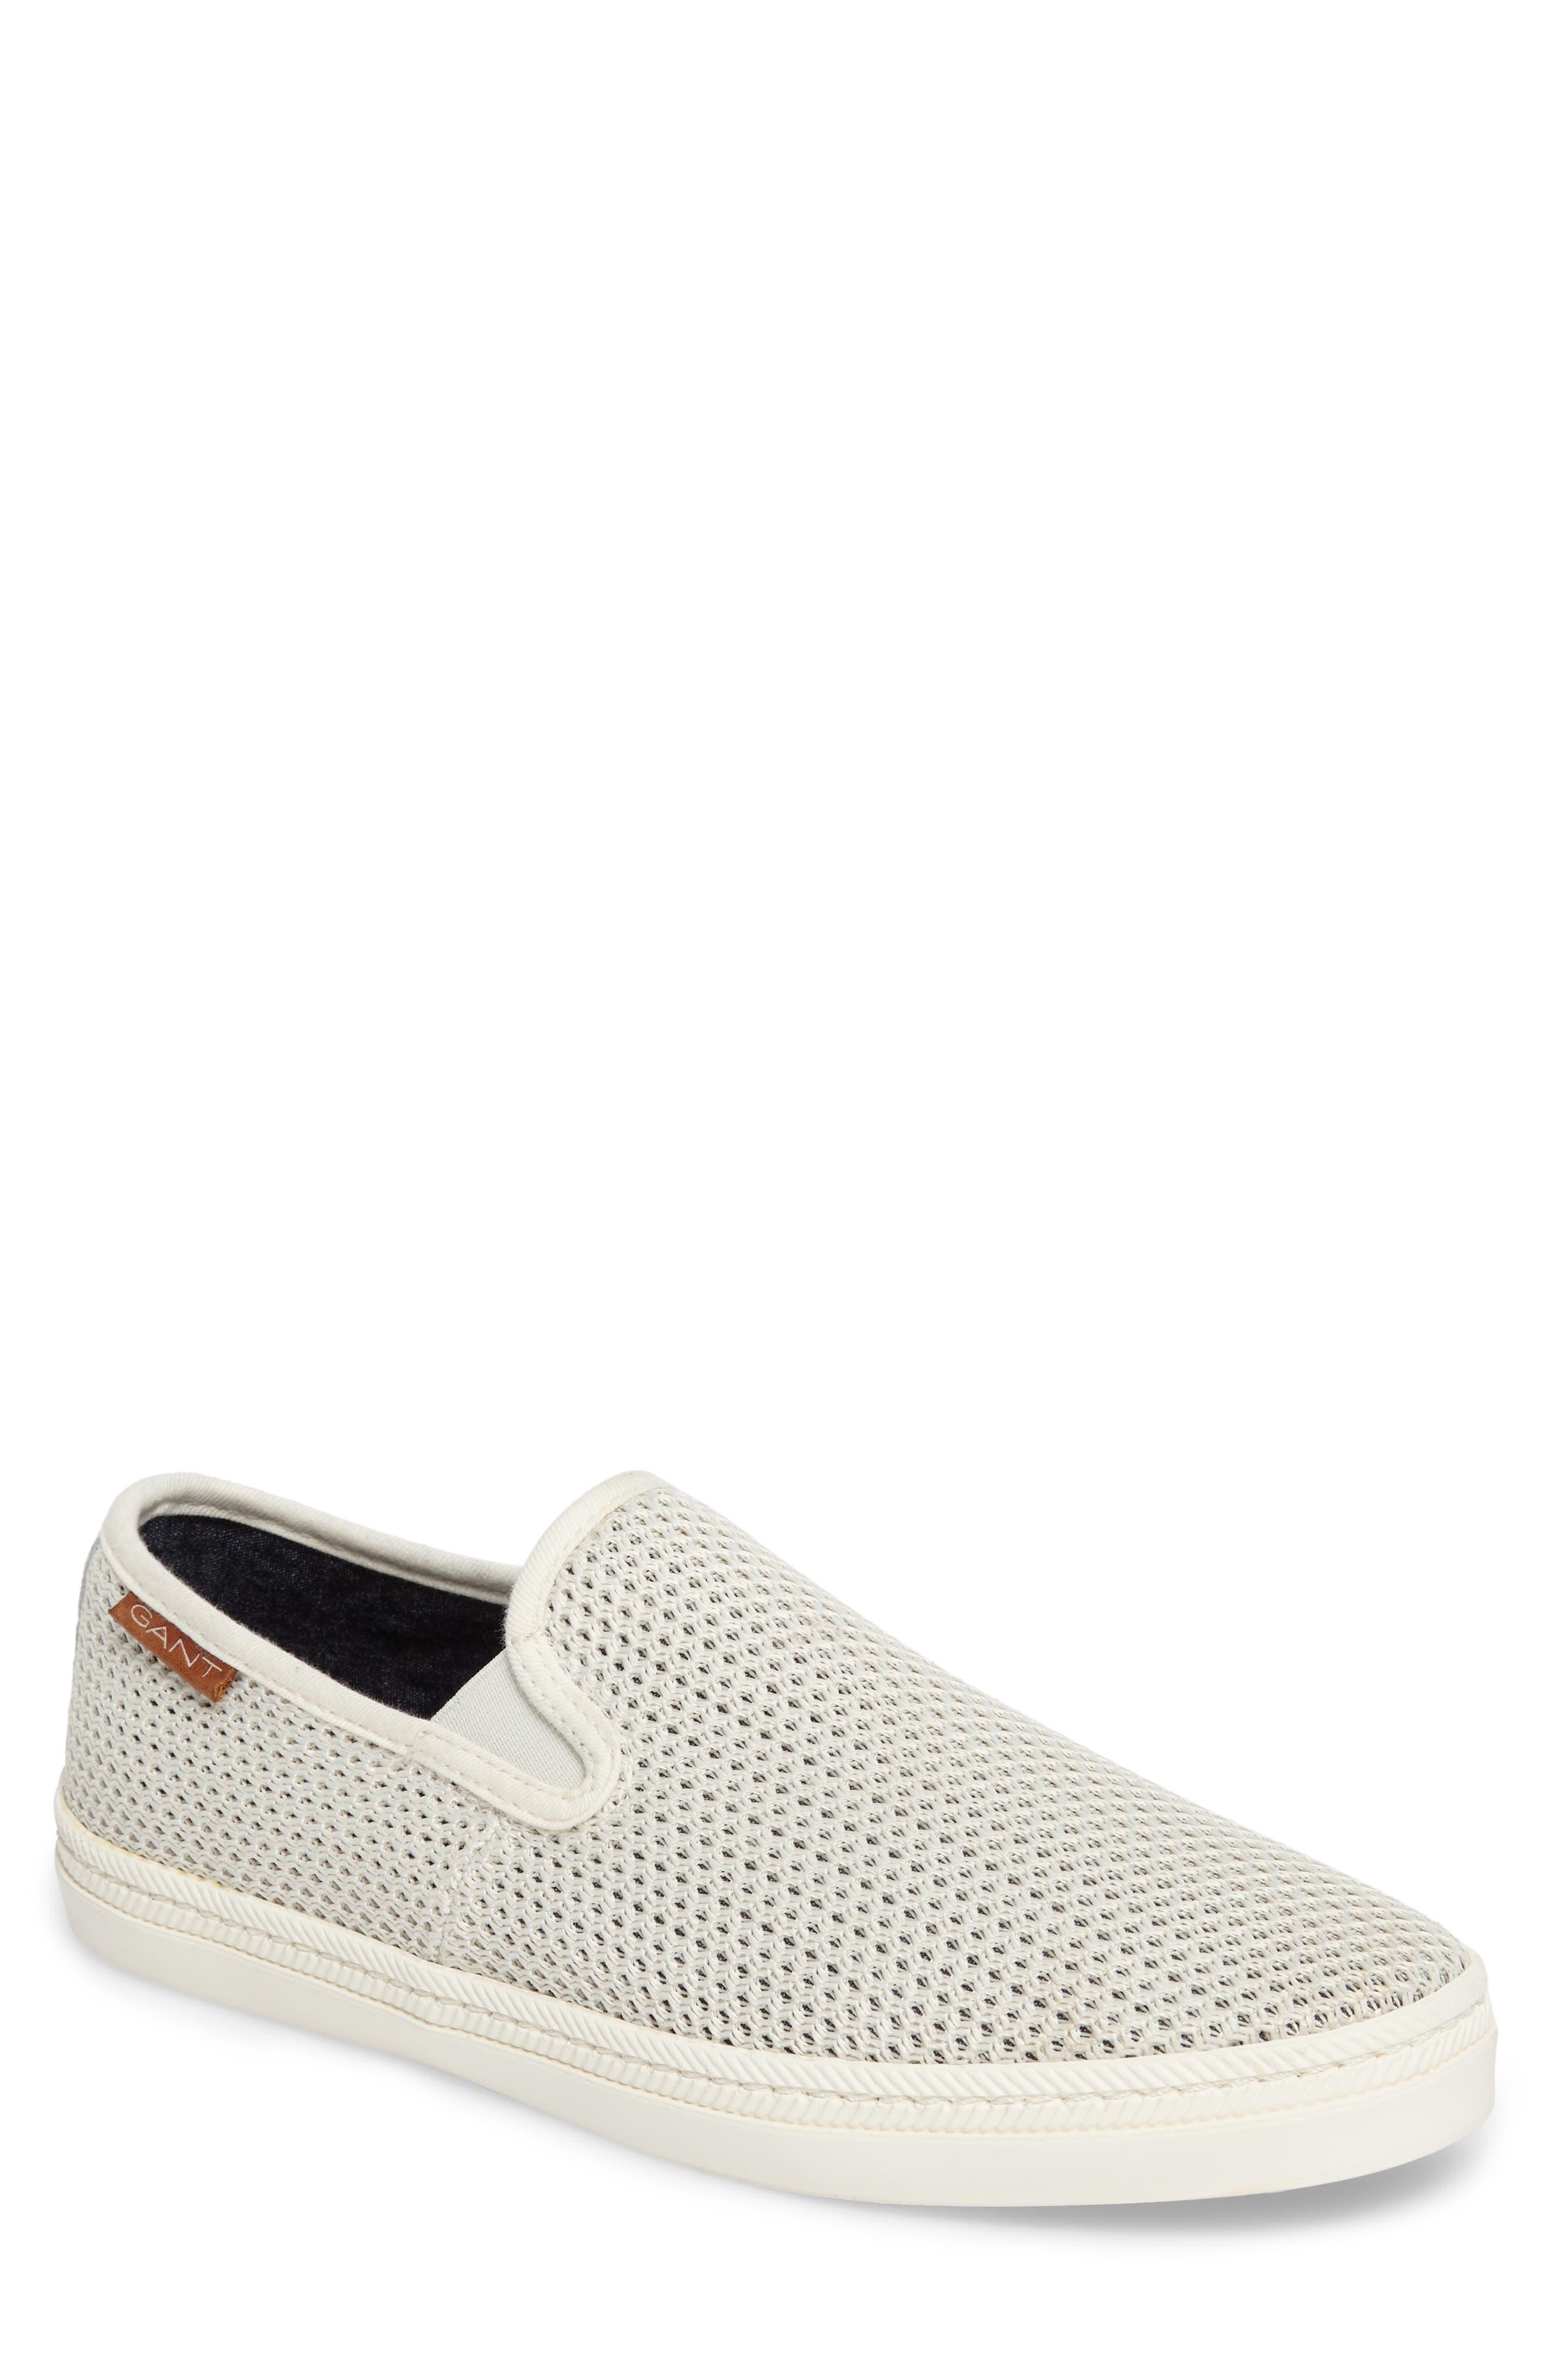 Delray Woven Slip-On Sneaker,                             Main thumbnail 1, color,                             Bone Beige Fabric